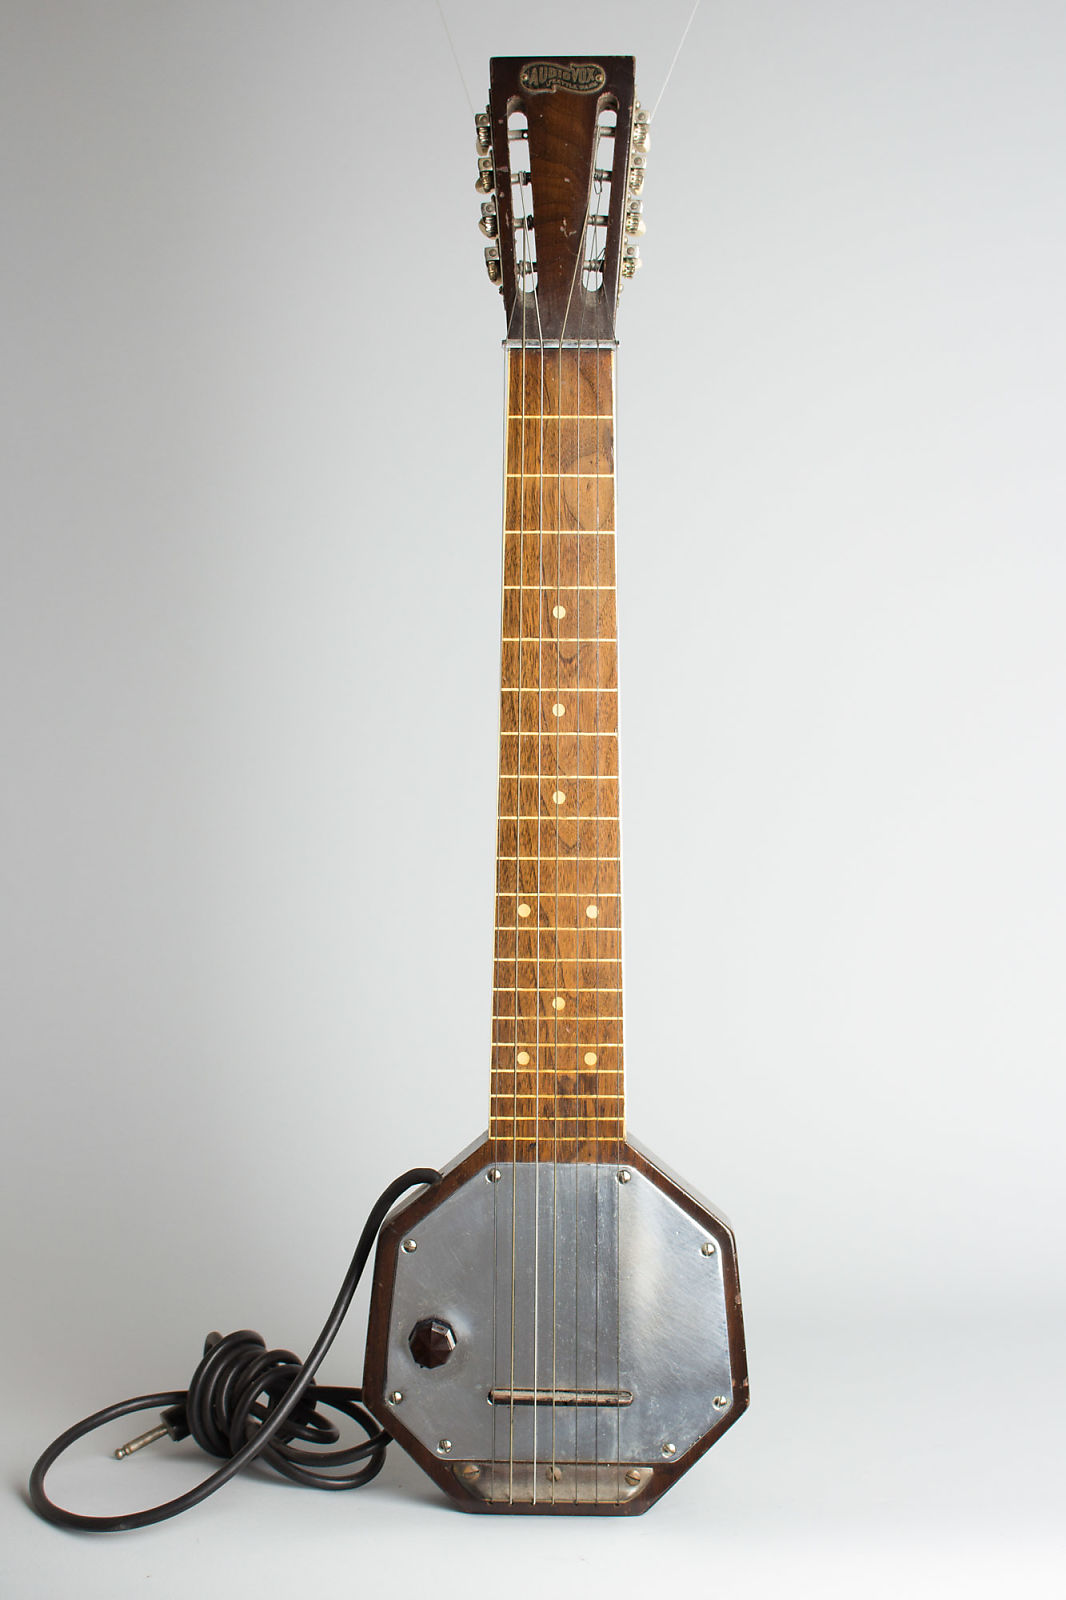 Audiovox  7-String Lap Steel Electric Guitar,  c. 1935, ser. #2369, original black hard shell case.